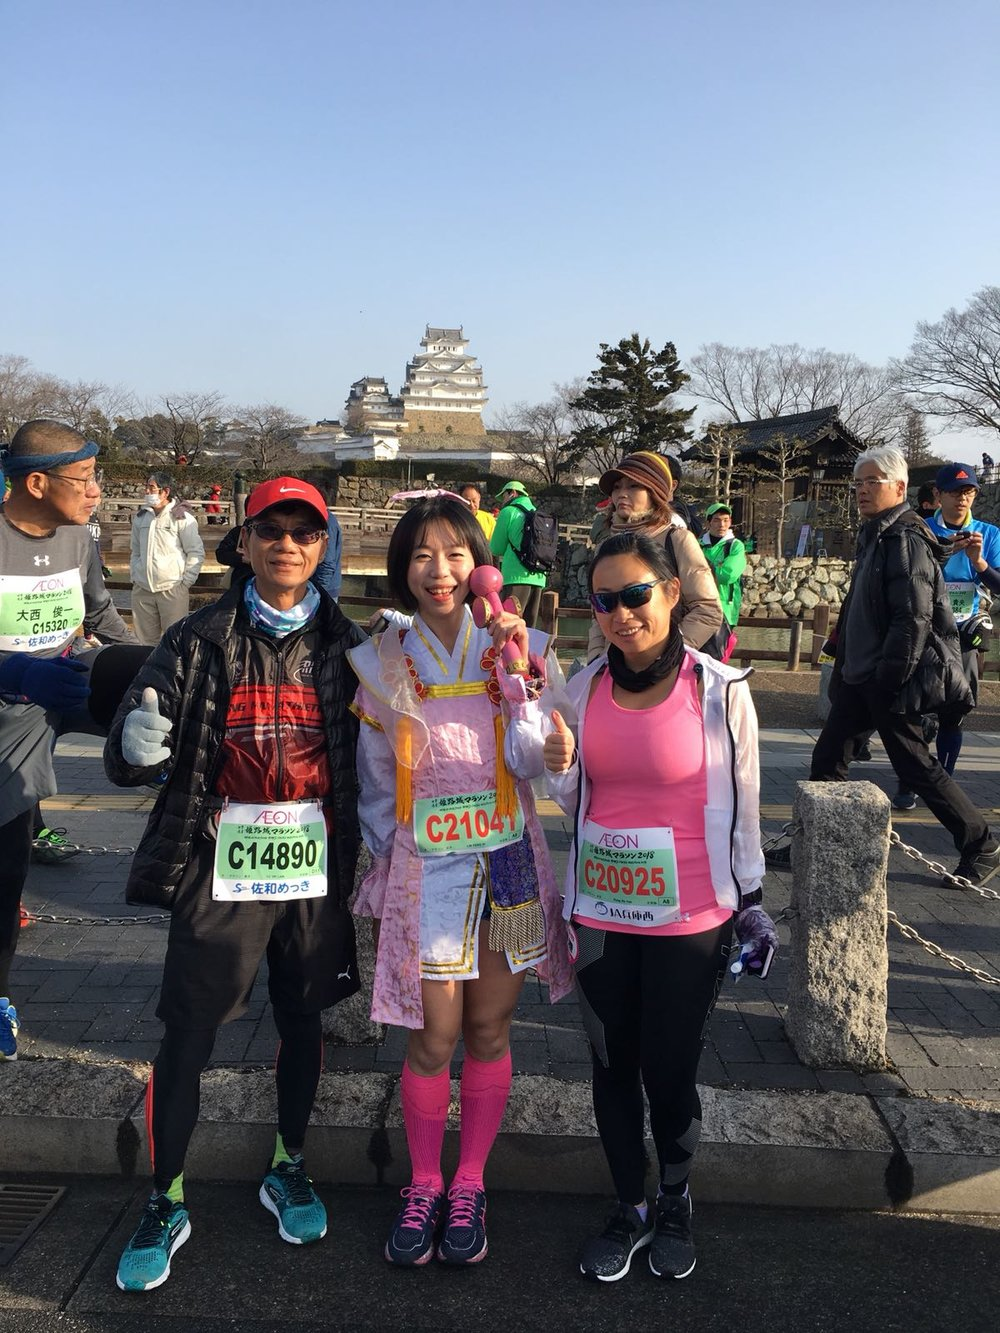 2018-02-20-PHOTO-00000833.jpg